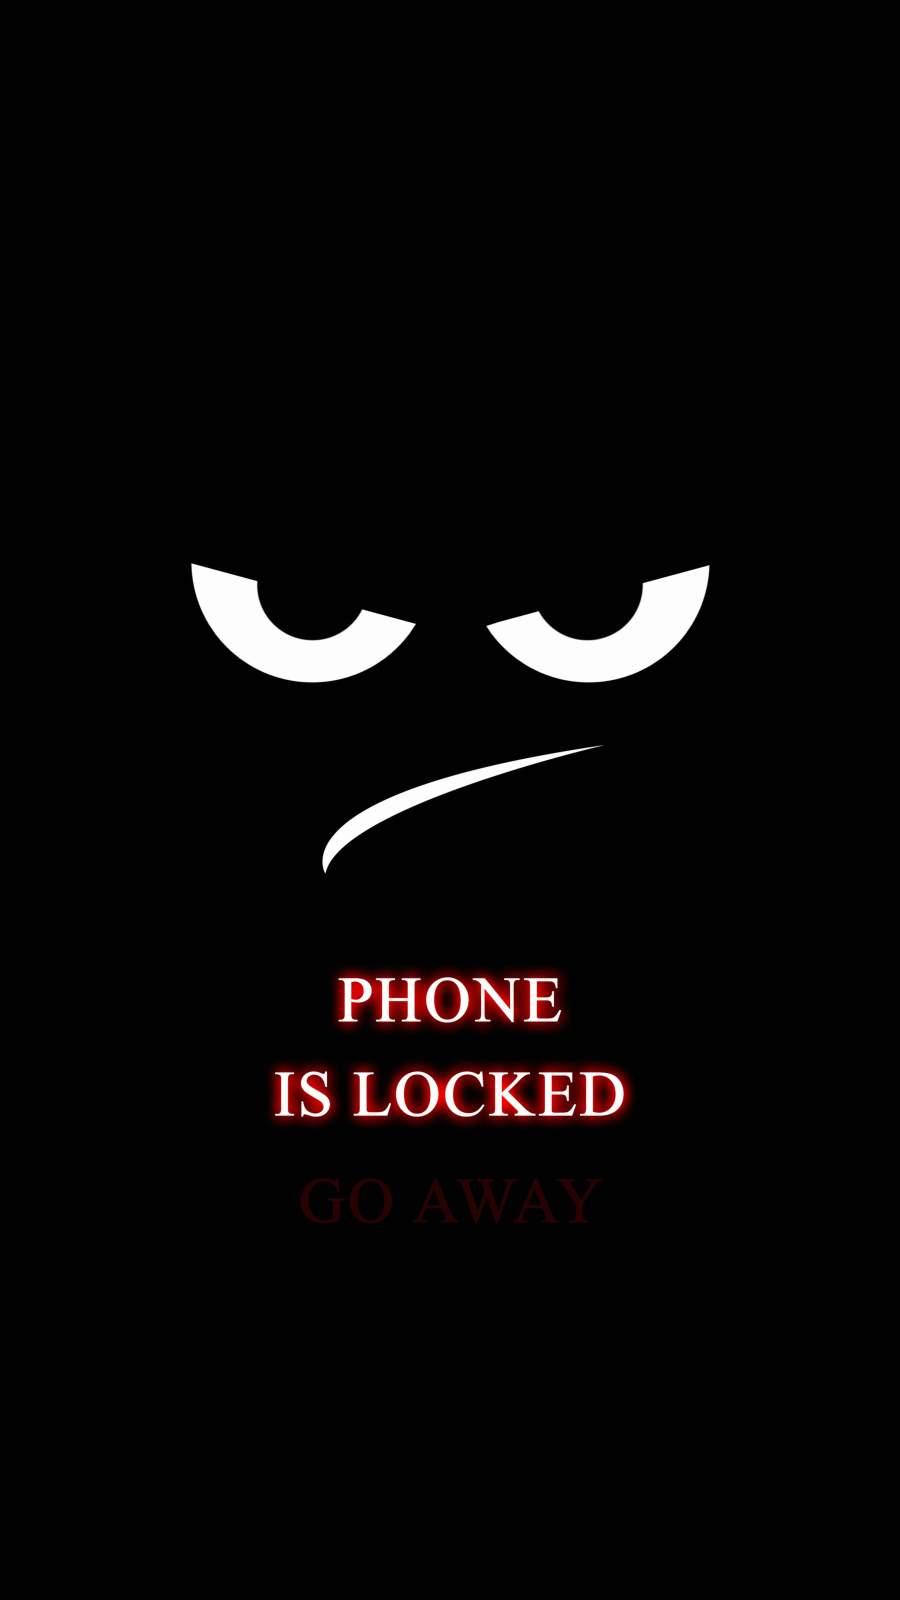 Phone is Locked Go Away